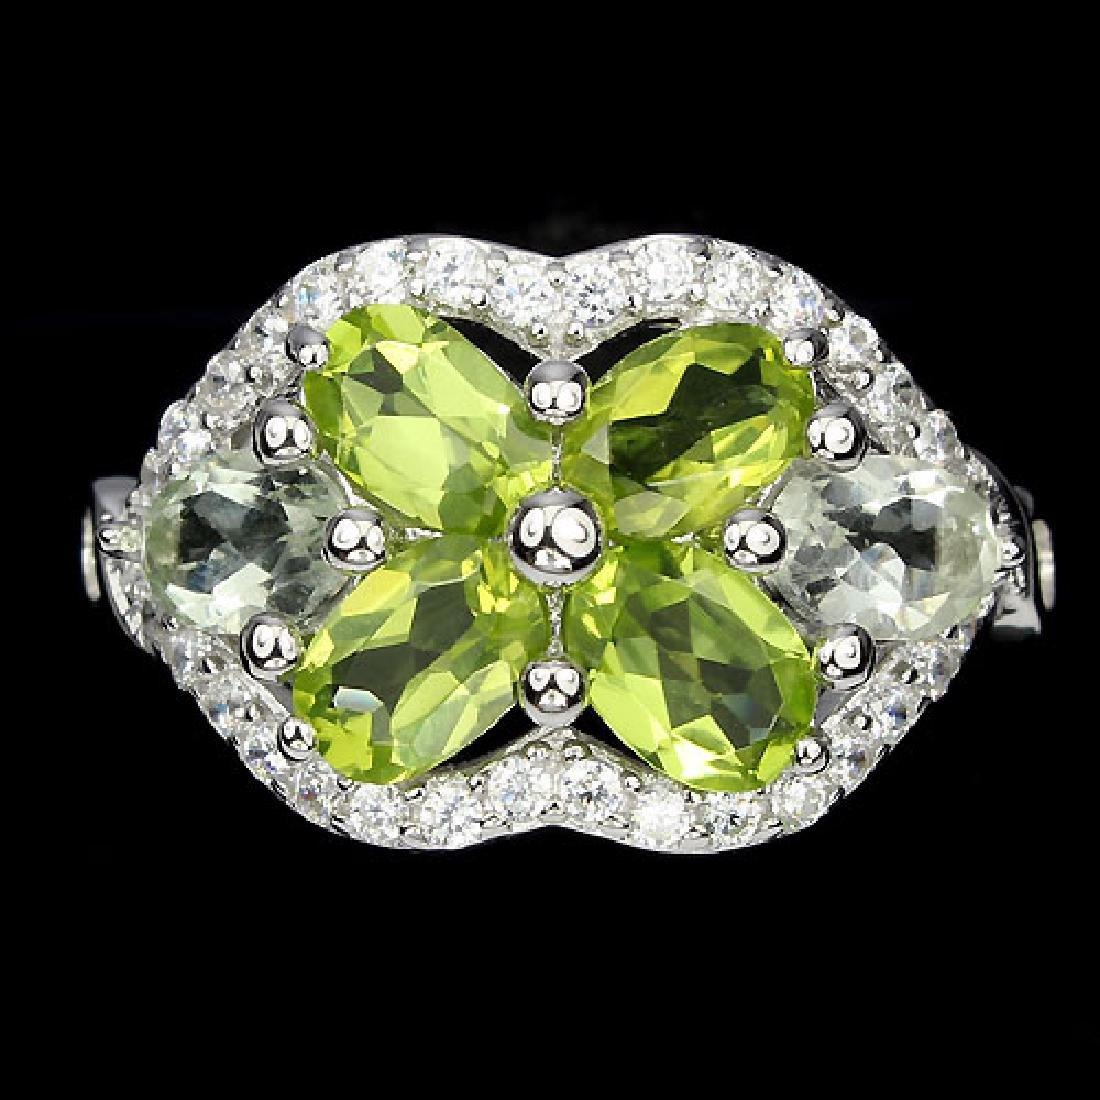 Natural Peridot & Light Tea Green Amethsyt Ring - 2